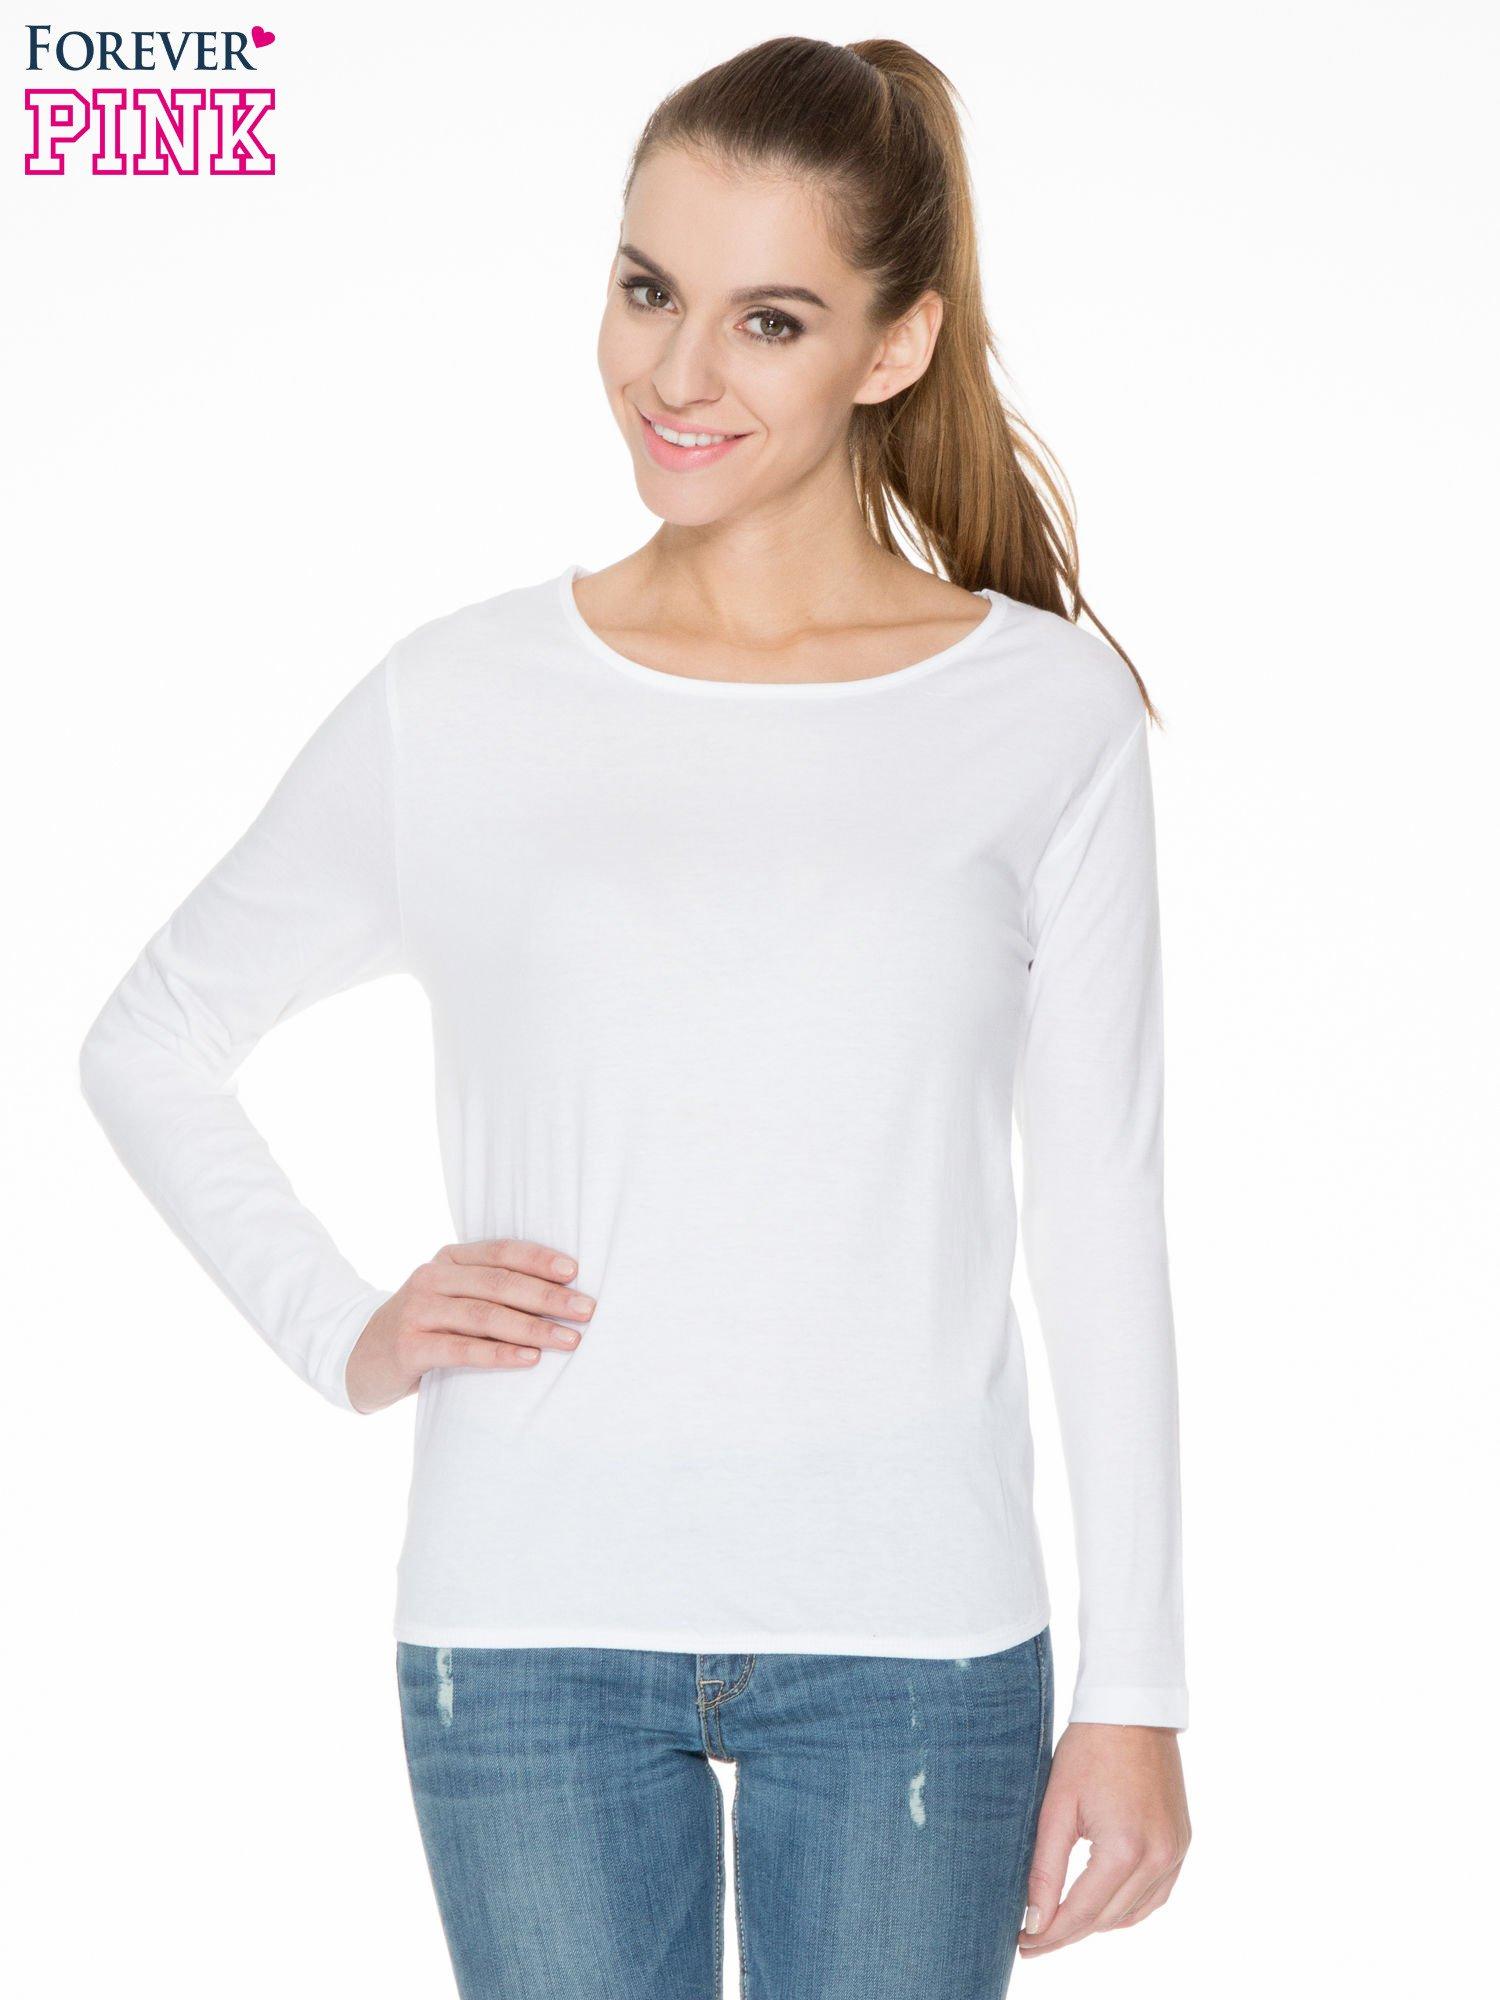 e0dde0321e1c Biała bawełniana bluzka z gumką na dole - Bluzka longsleeves - sklep ...